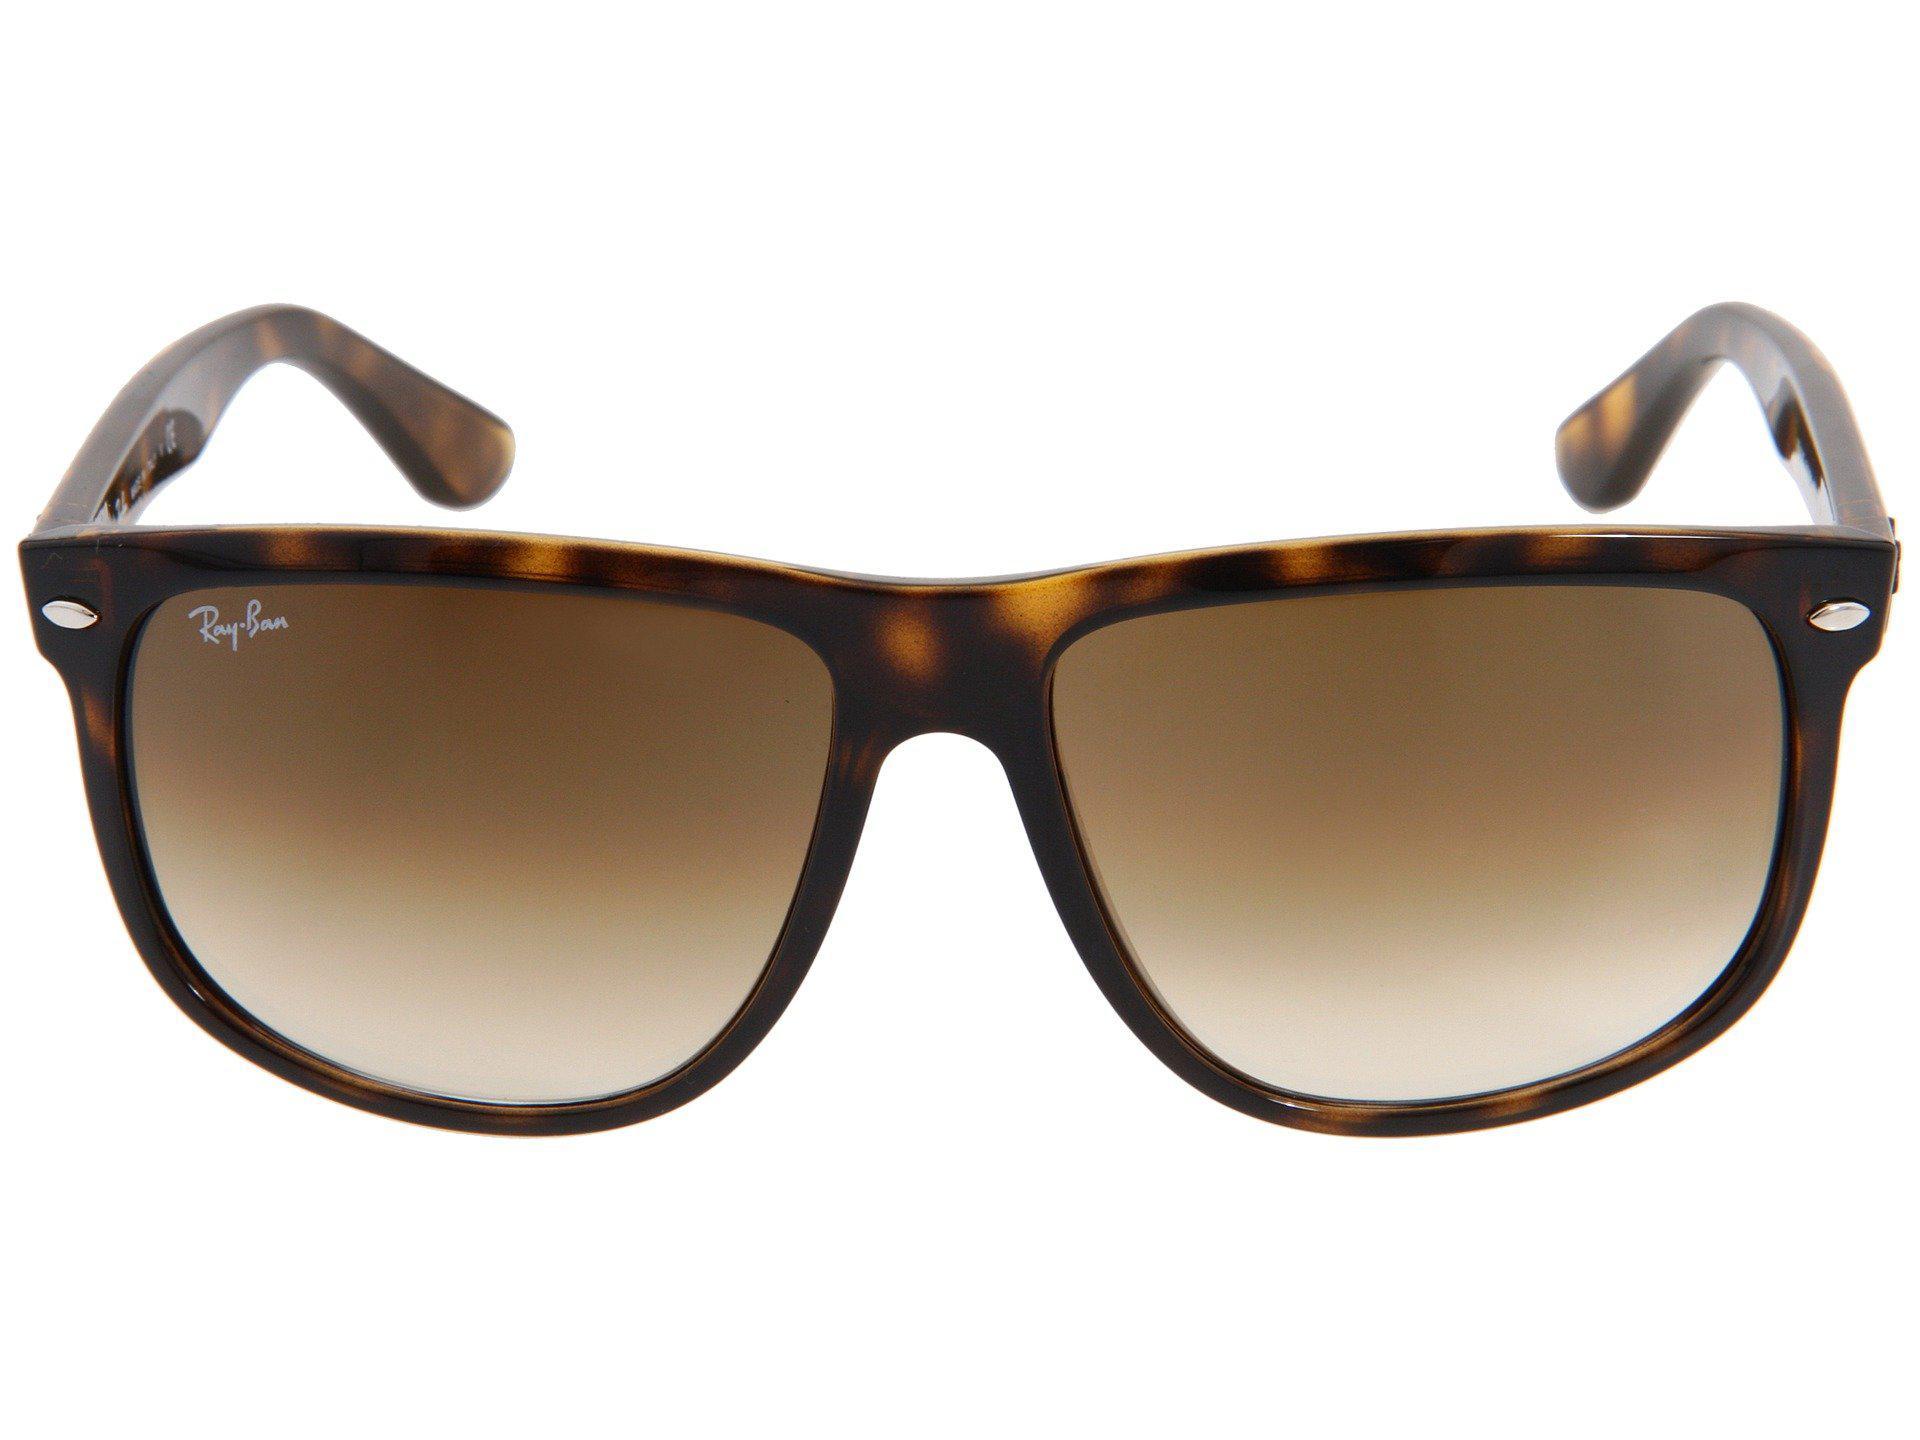 28933b2d0a Ray-Ban - Brown Rb4147 Boyfriend (black black) Fashion Sunglasses - Lyst.  View fullscreen